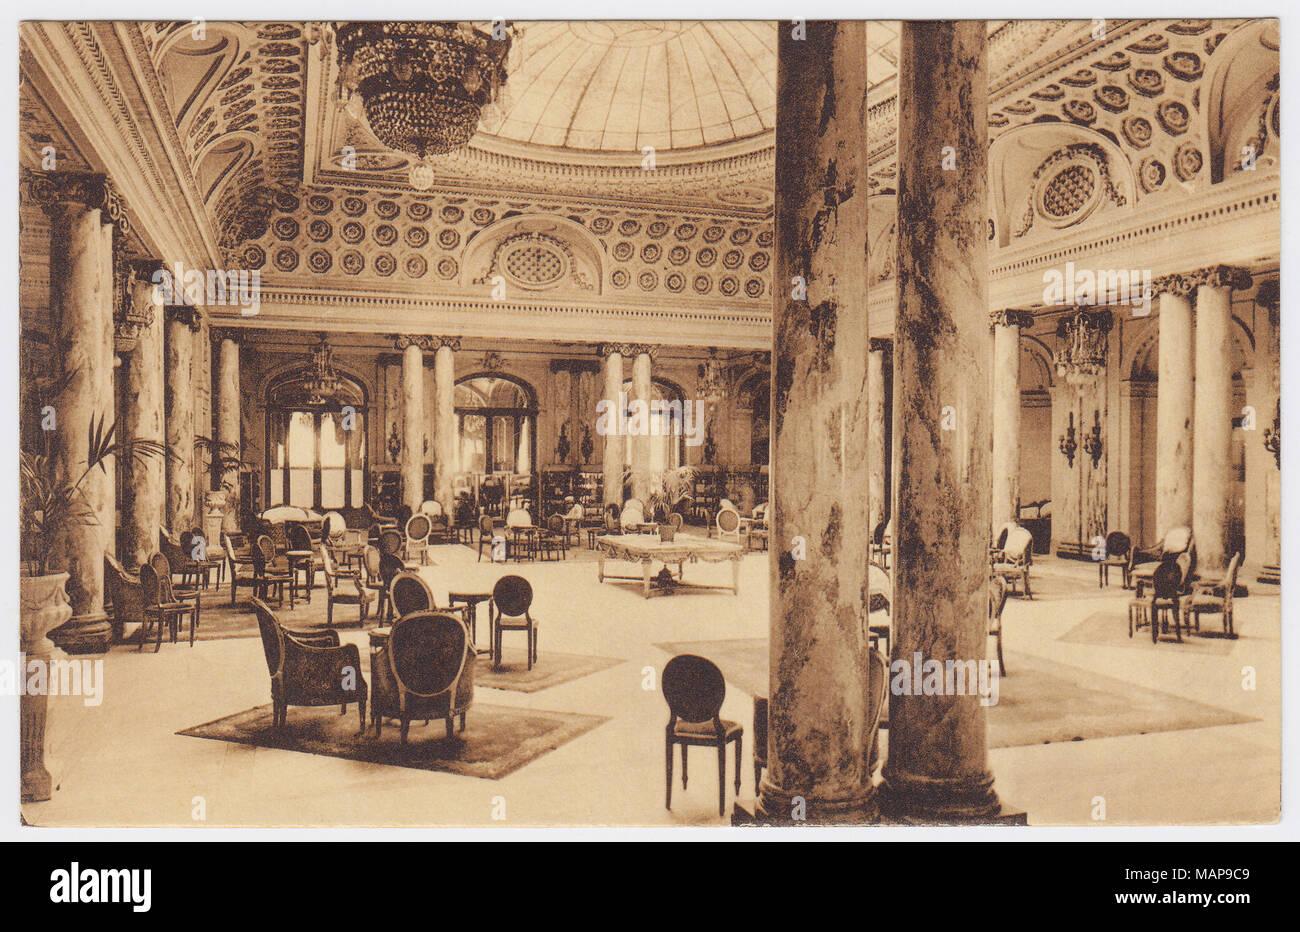 Hôtel Ruhl, Nice, France, Hall - Stock Image